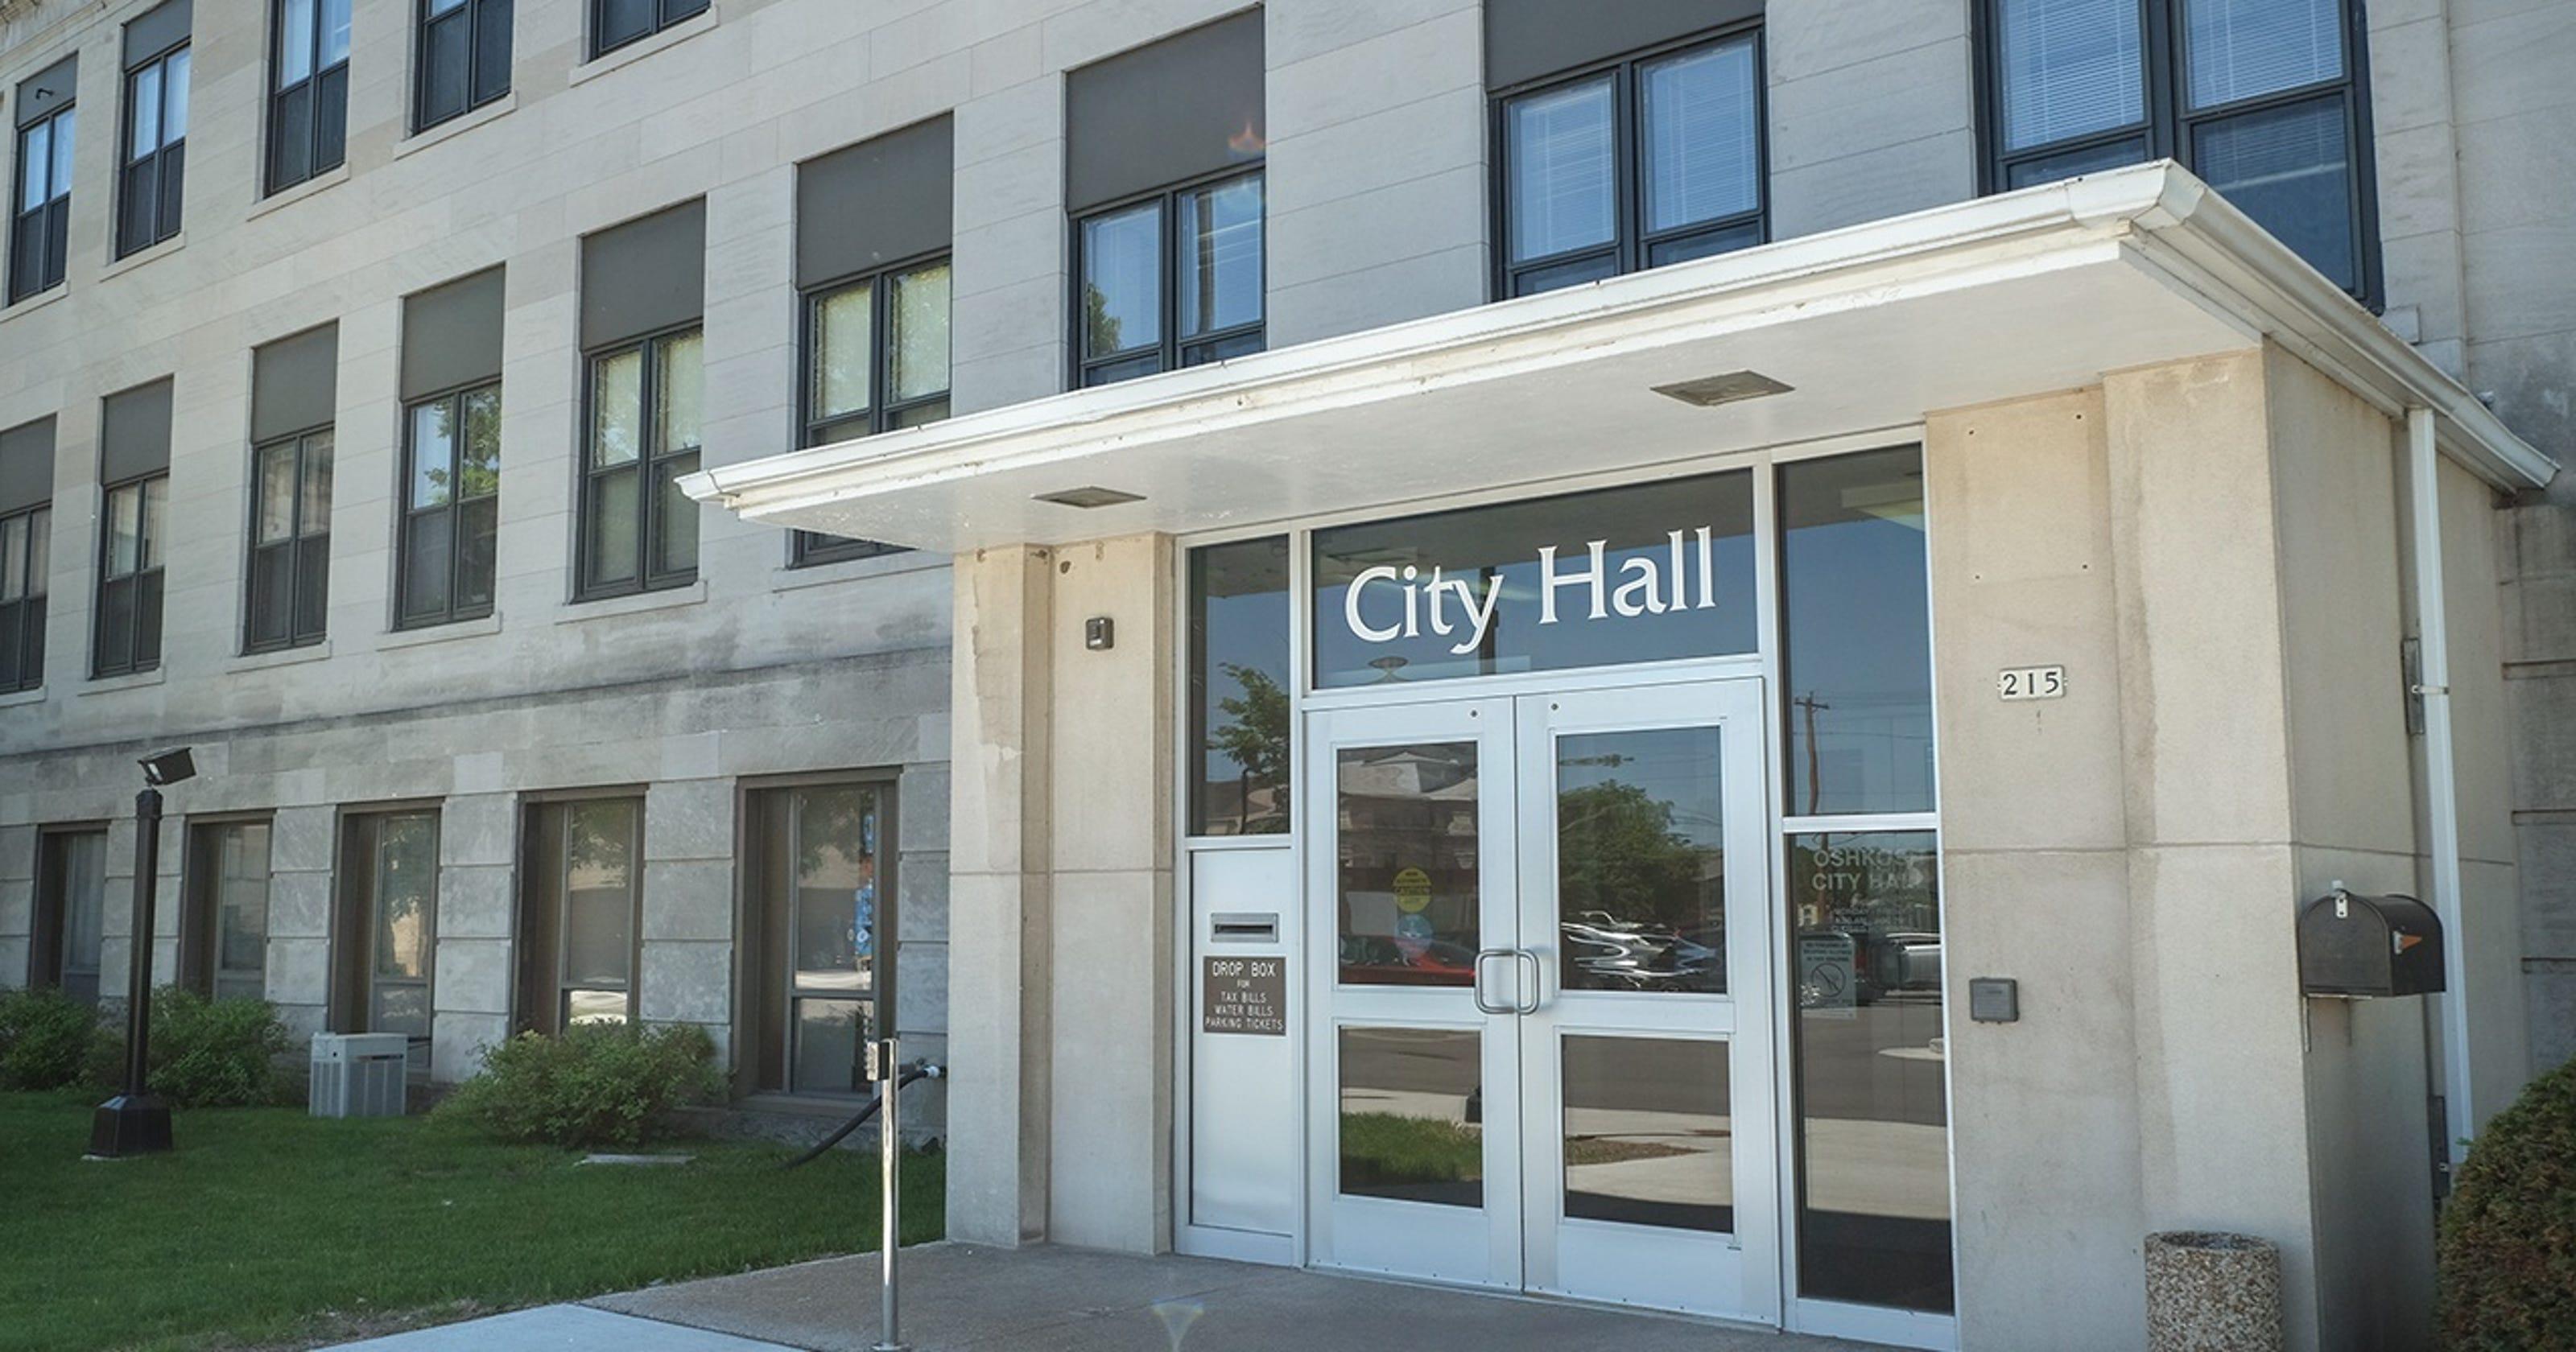 Oshkosh rentals: City OKs short-term room tax starting after EAA